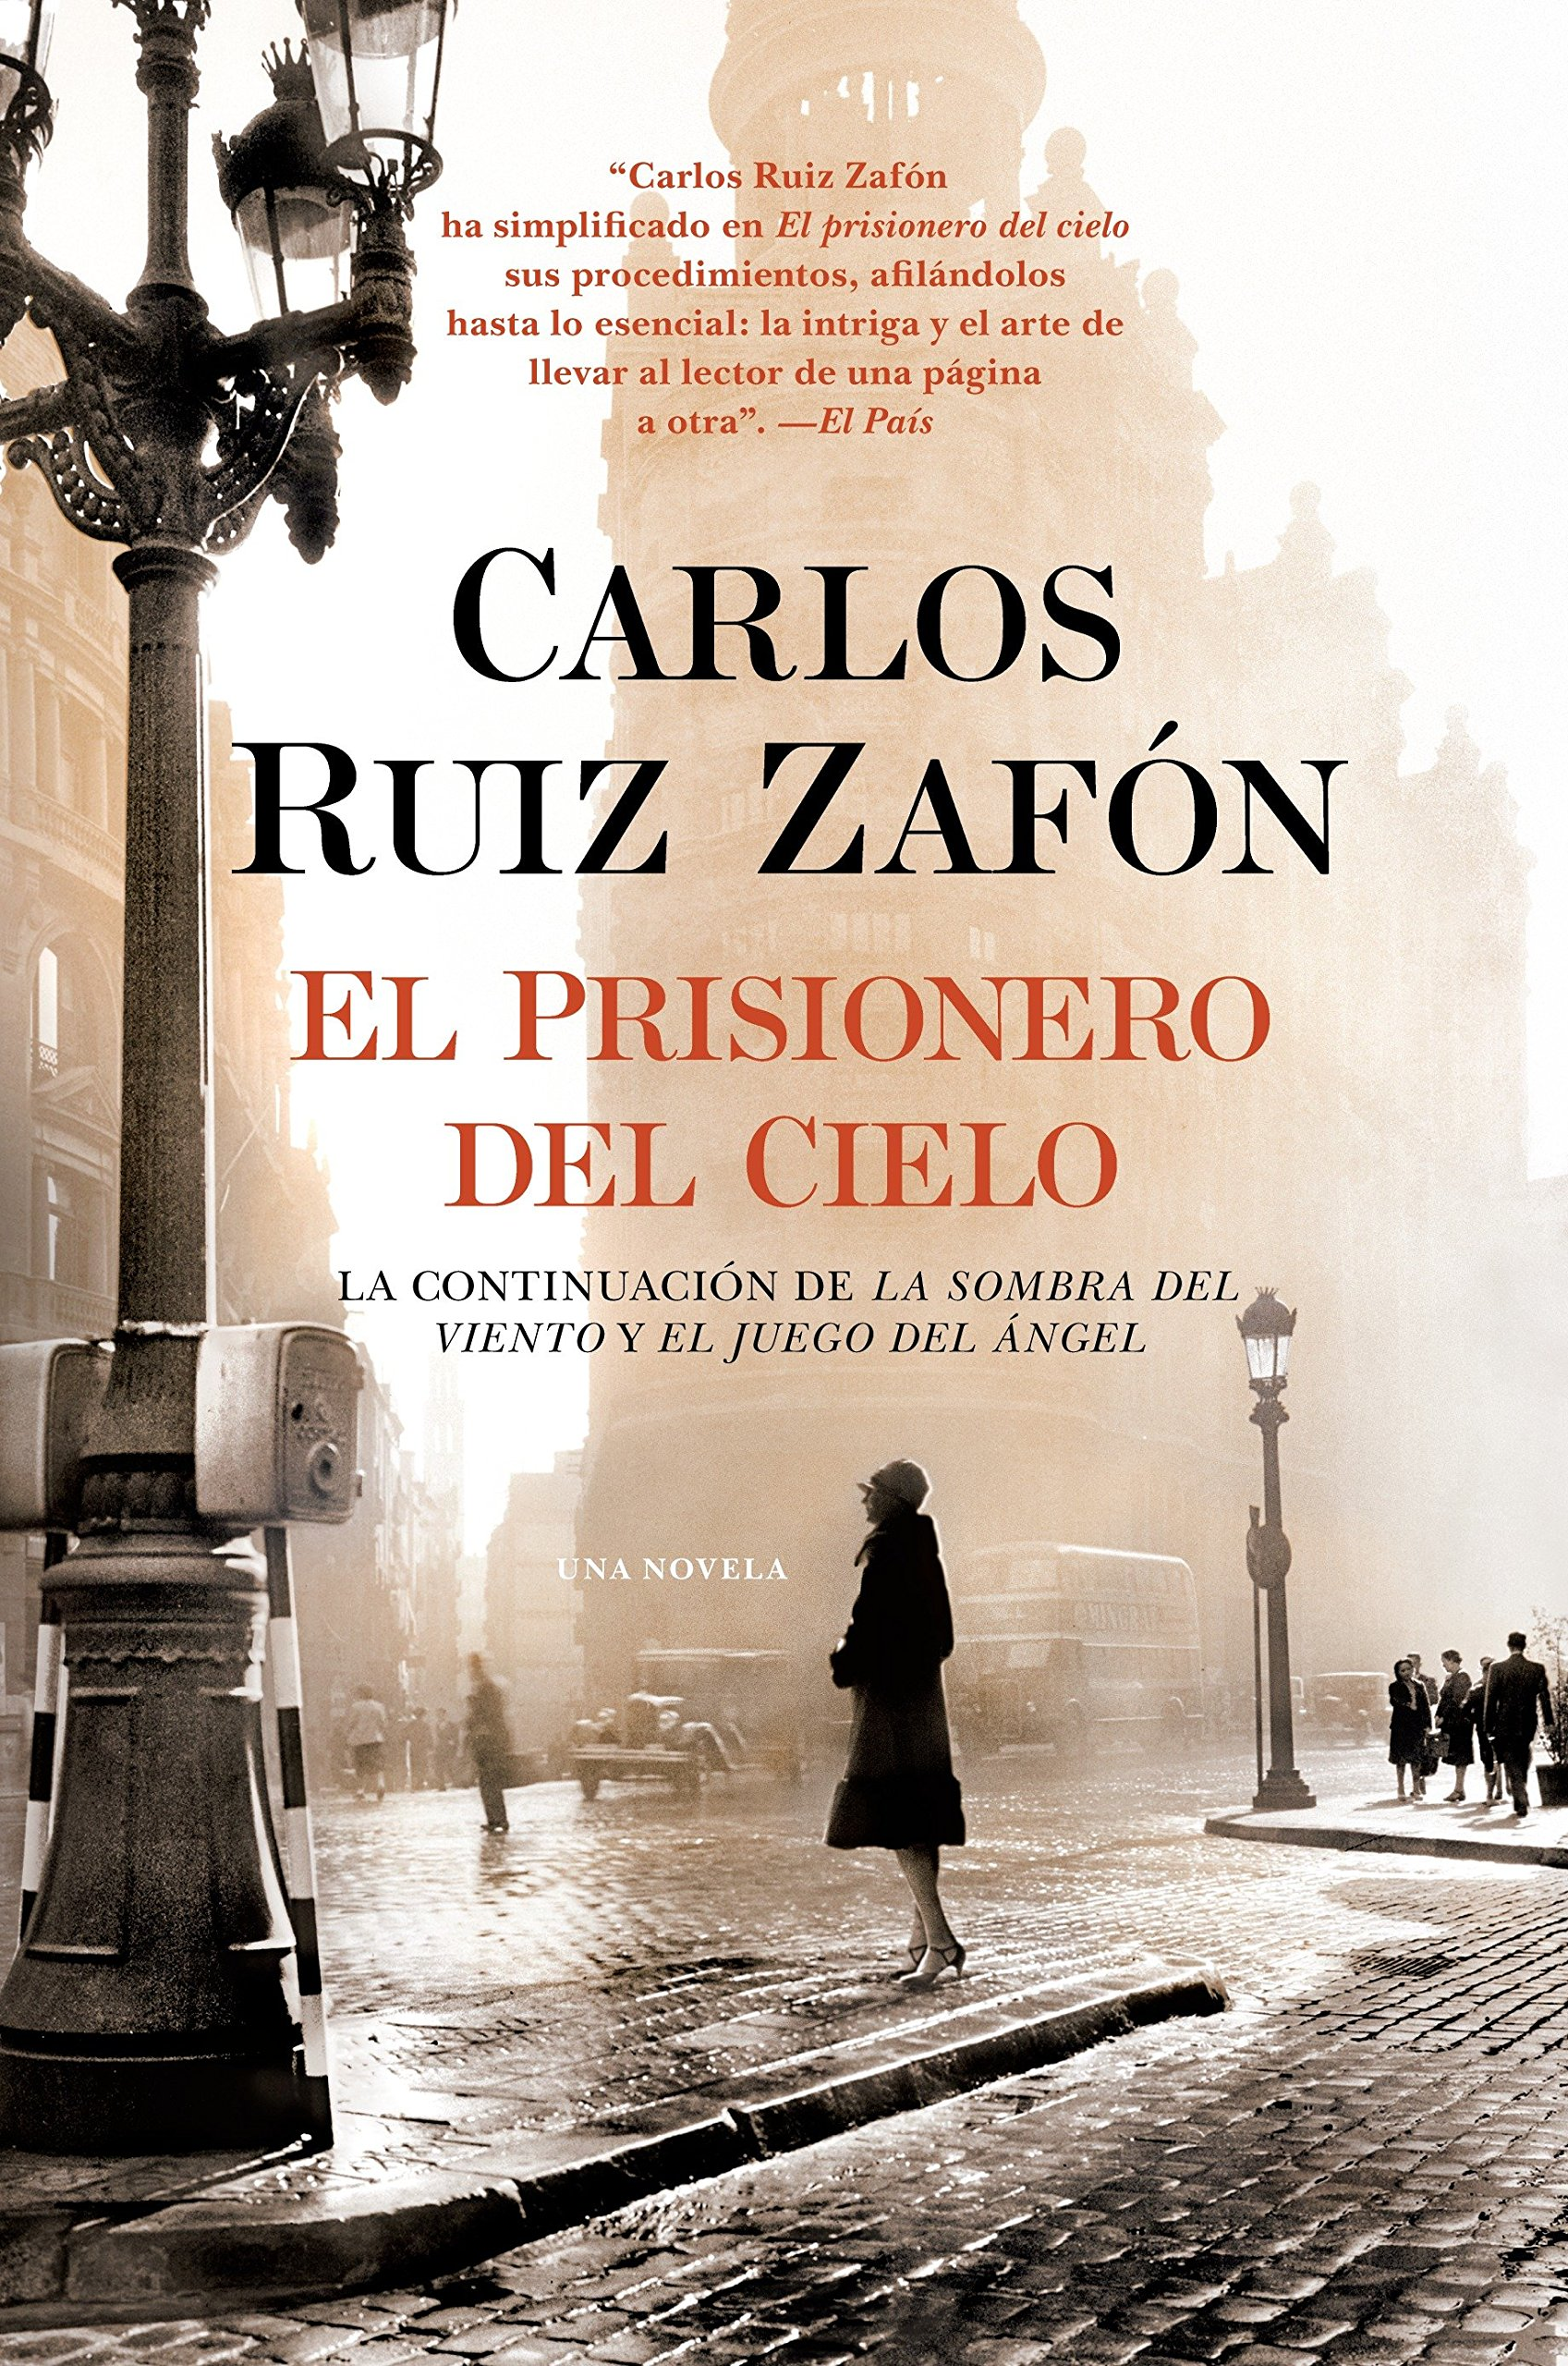 Amazon.com: El Prisionero del Cielo (Spanish Edition) (9780345803306):  Carlos Ruiz Zafon: Books